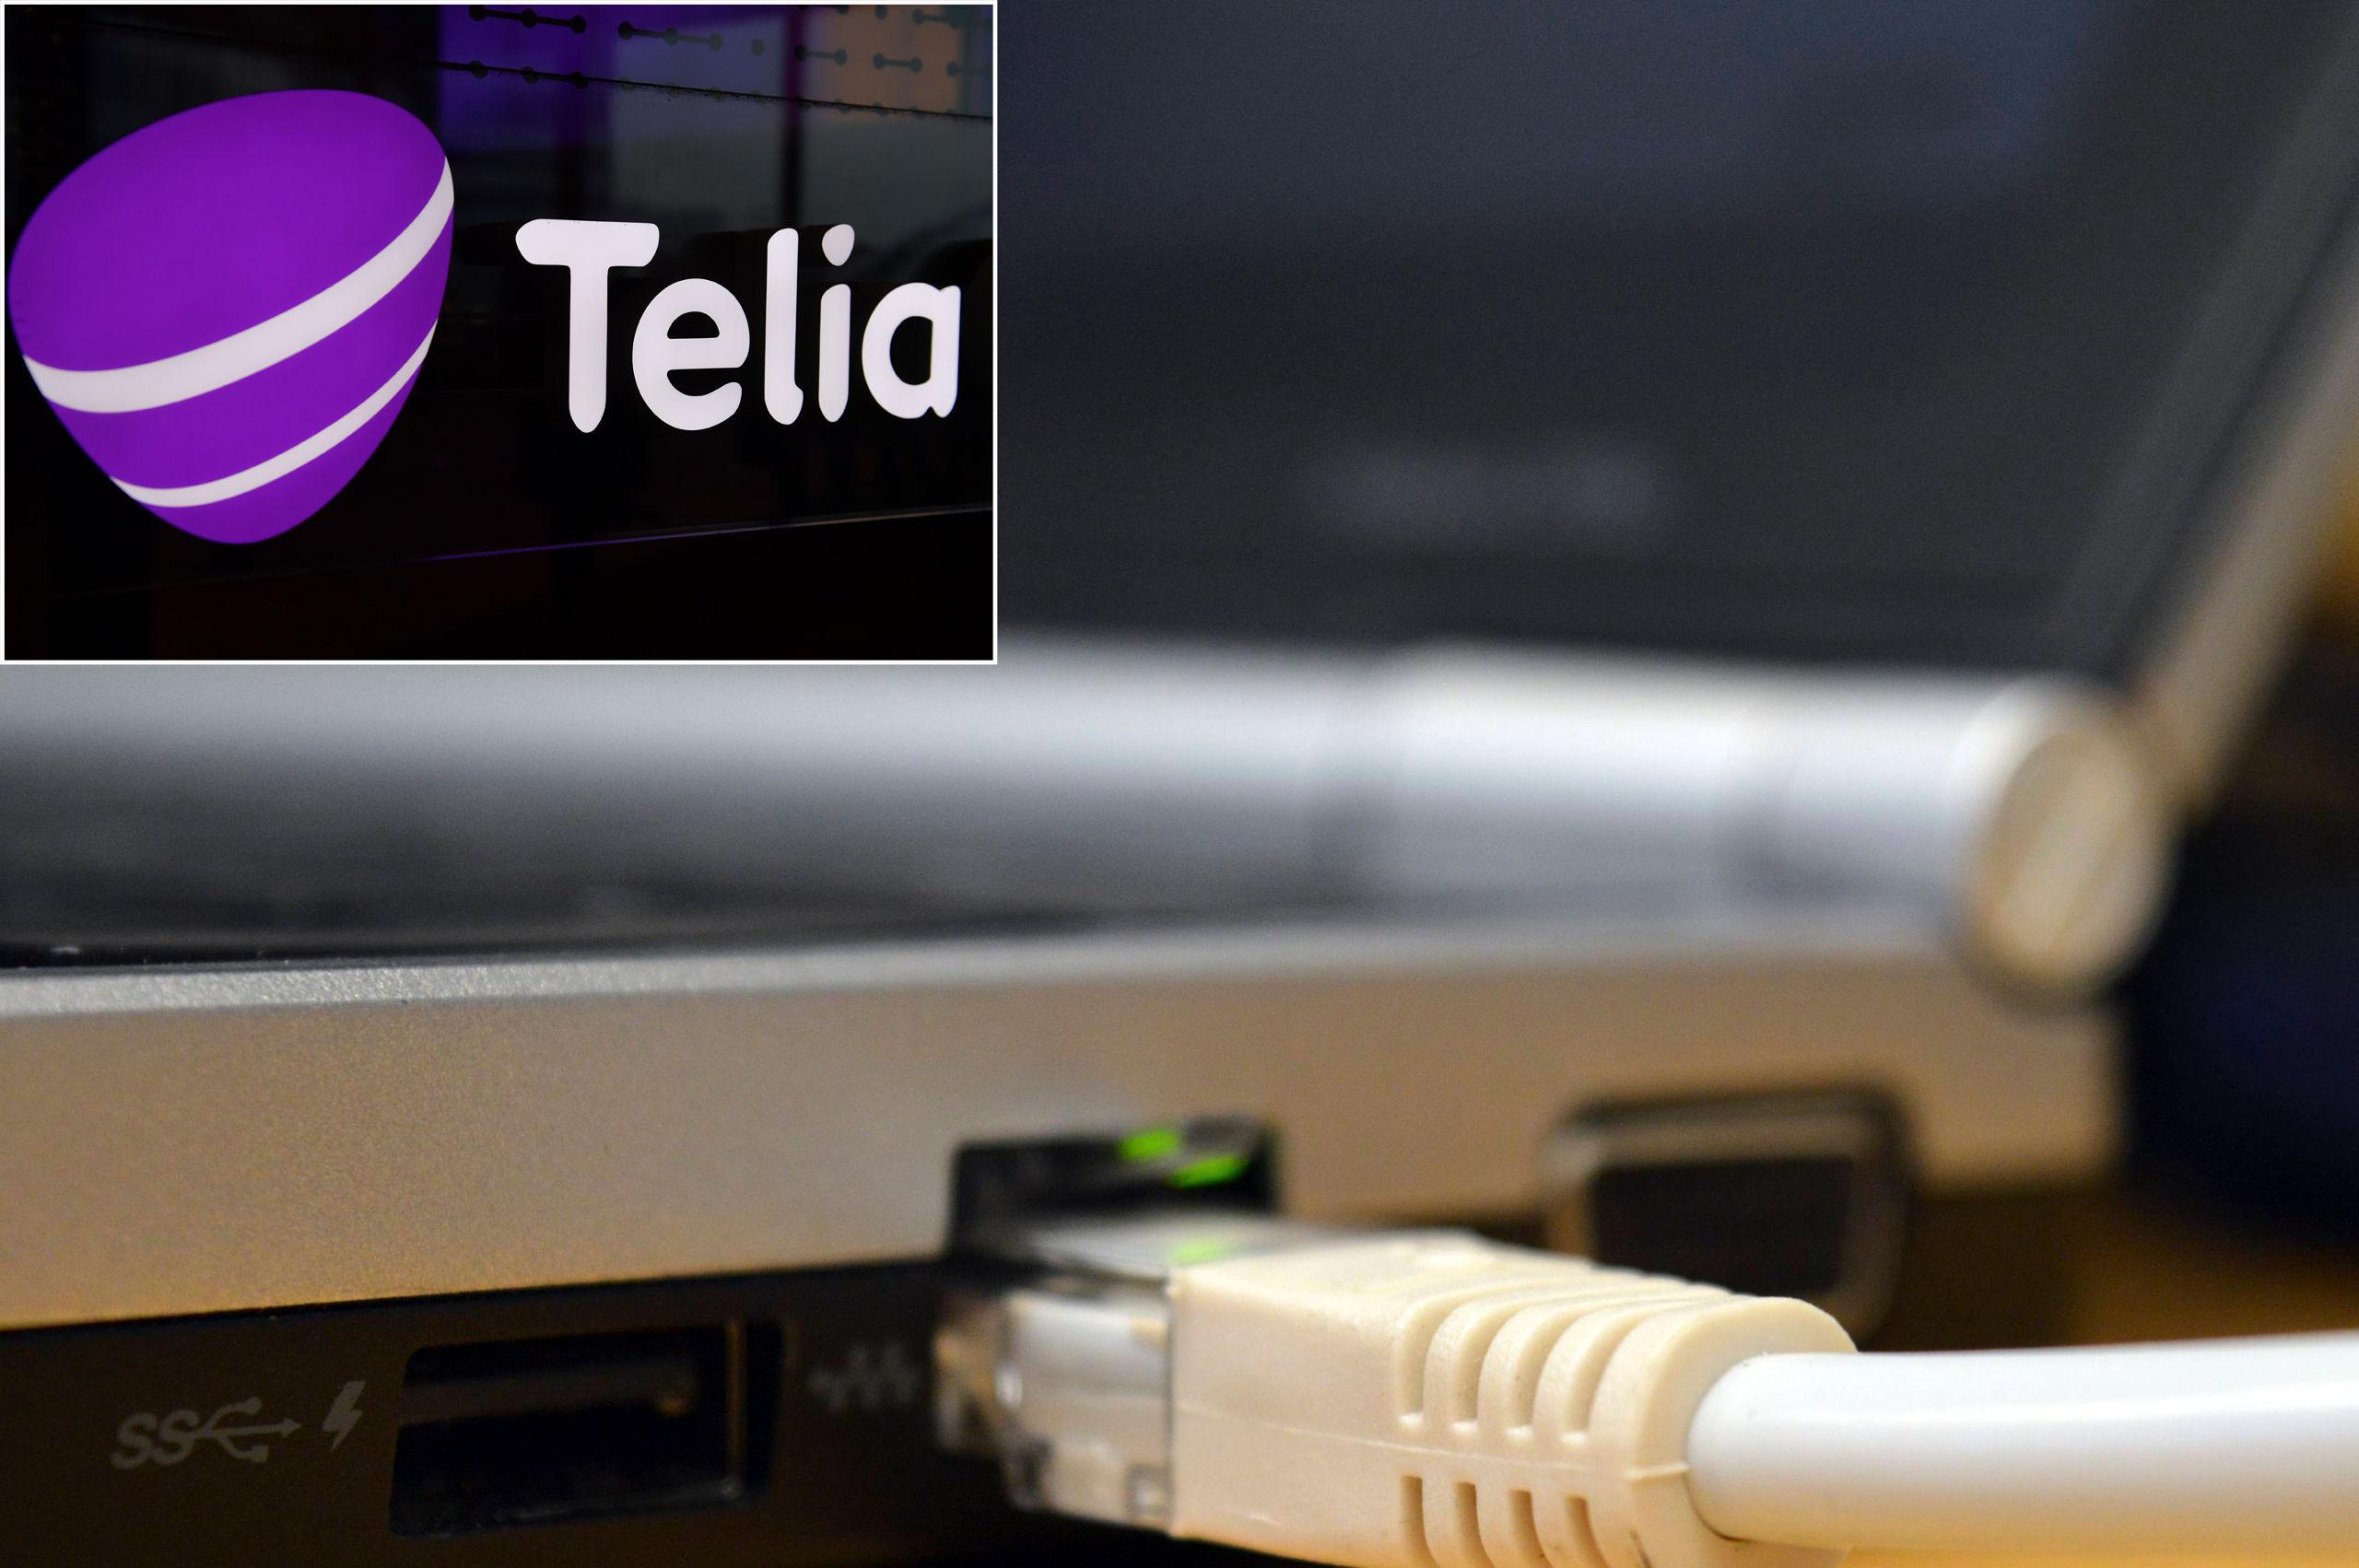 telia bredband företag fiber